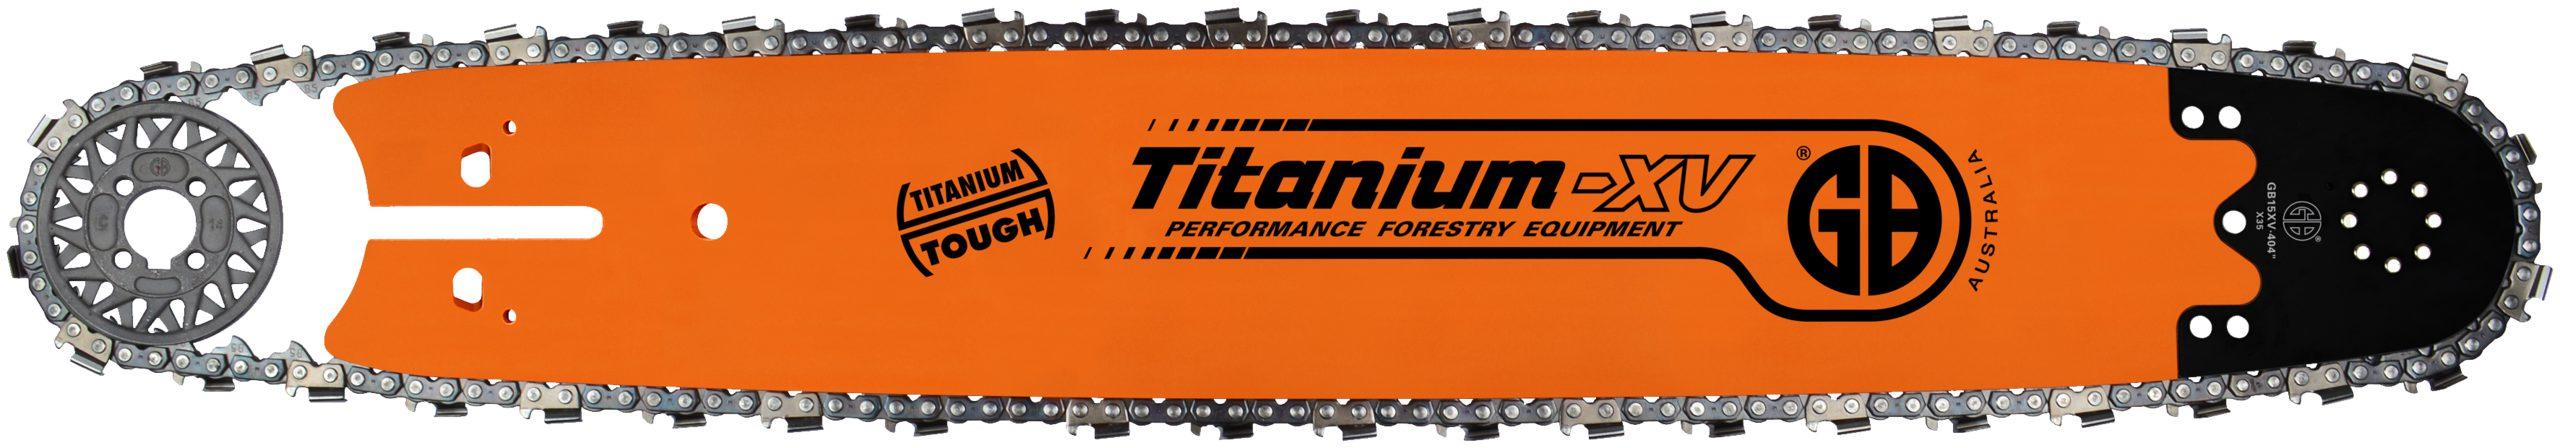 Sina de ghidaj GB Titanium XV Harvester